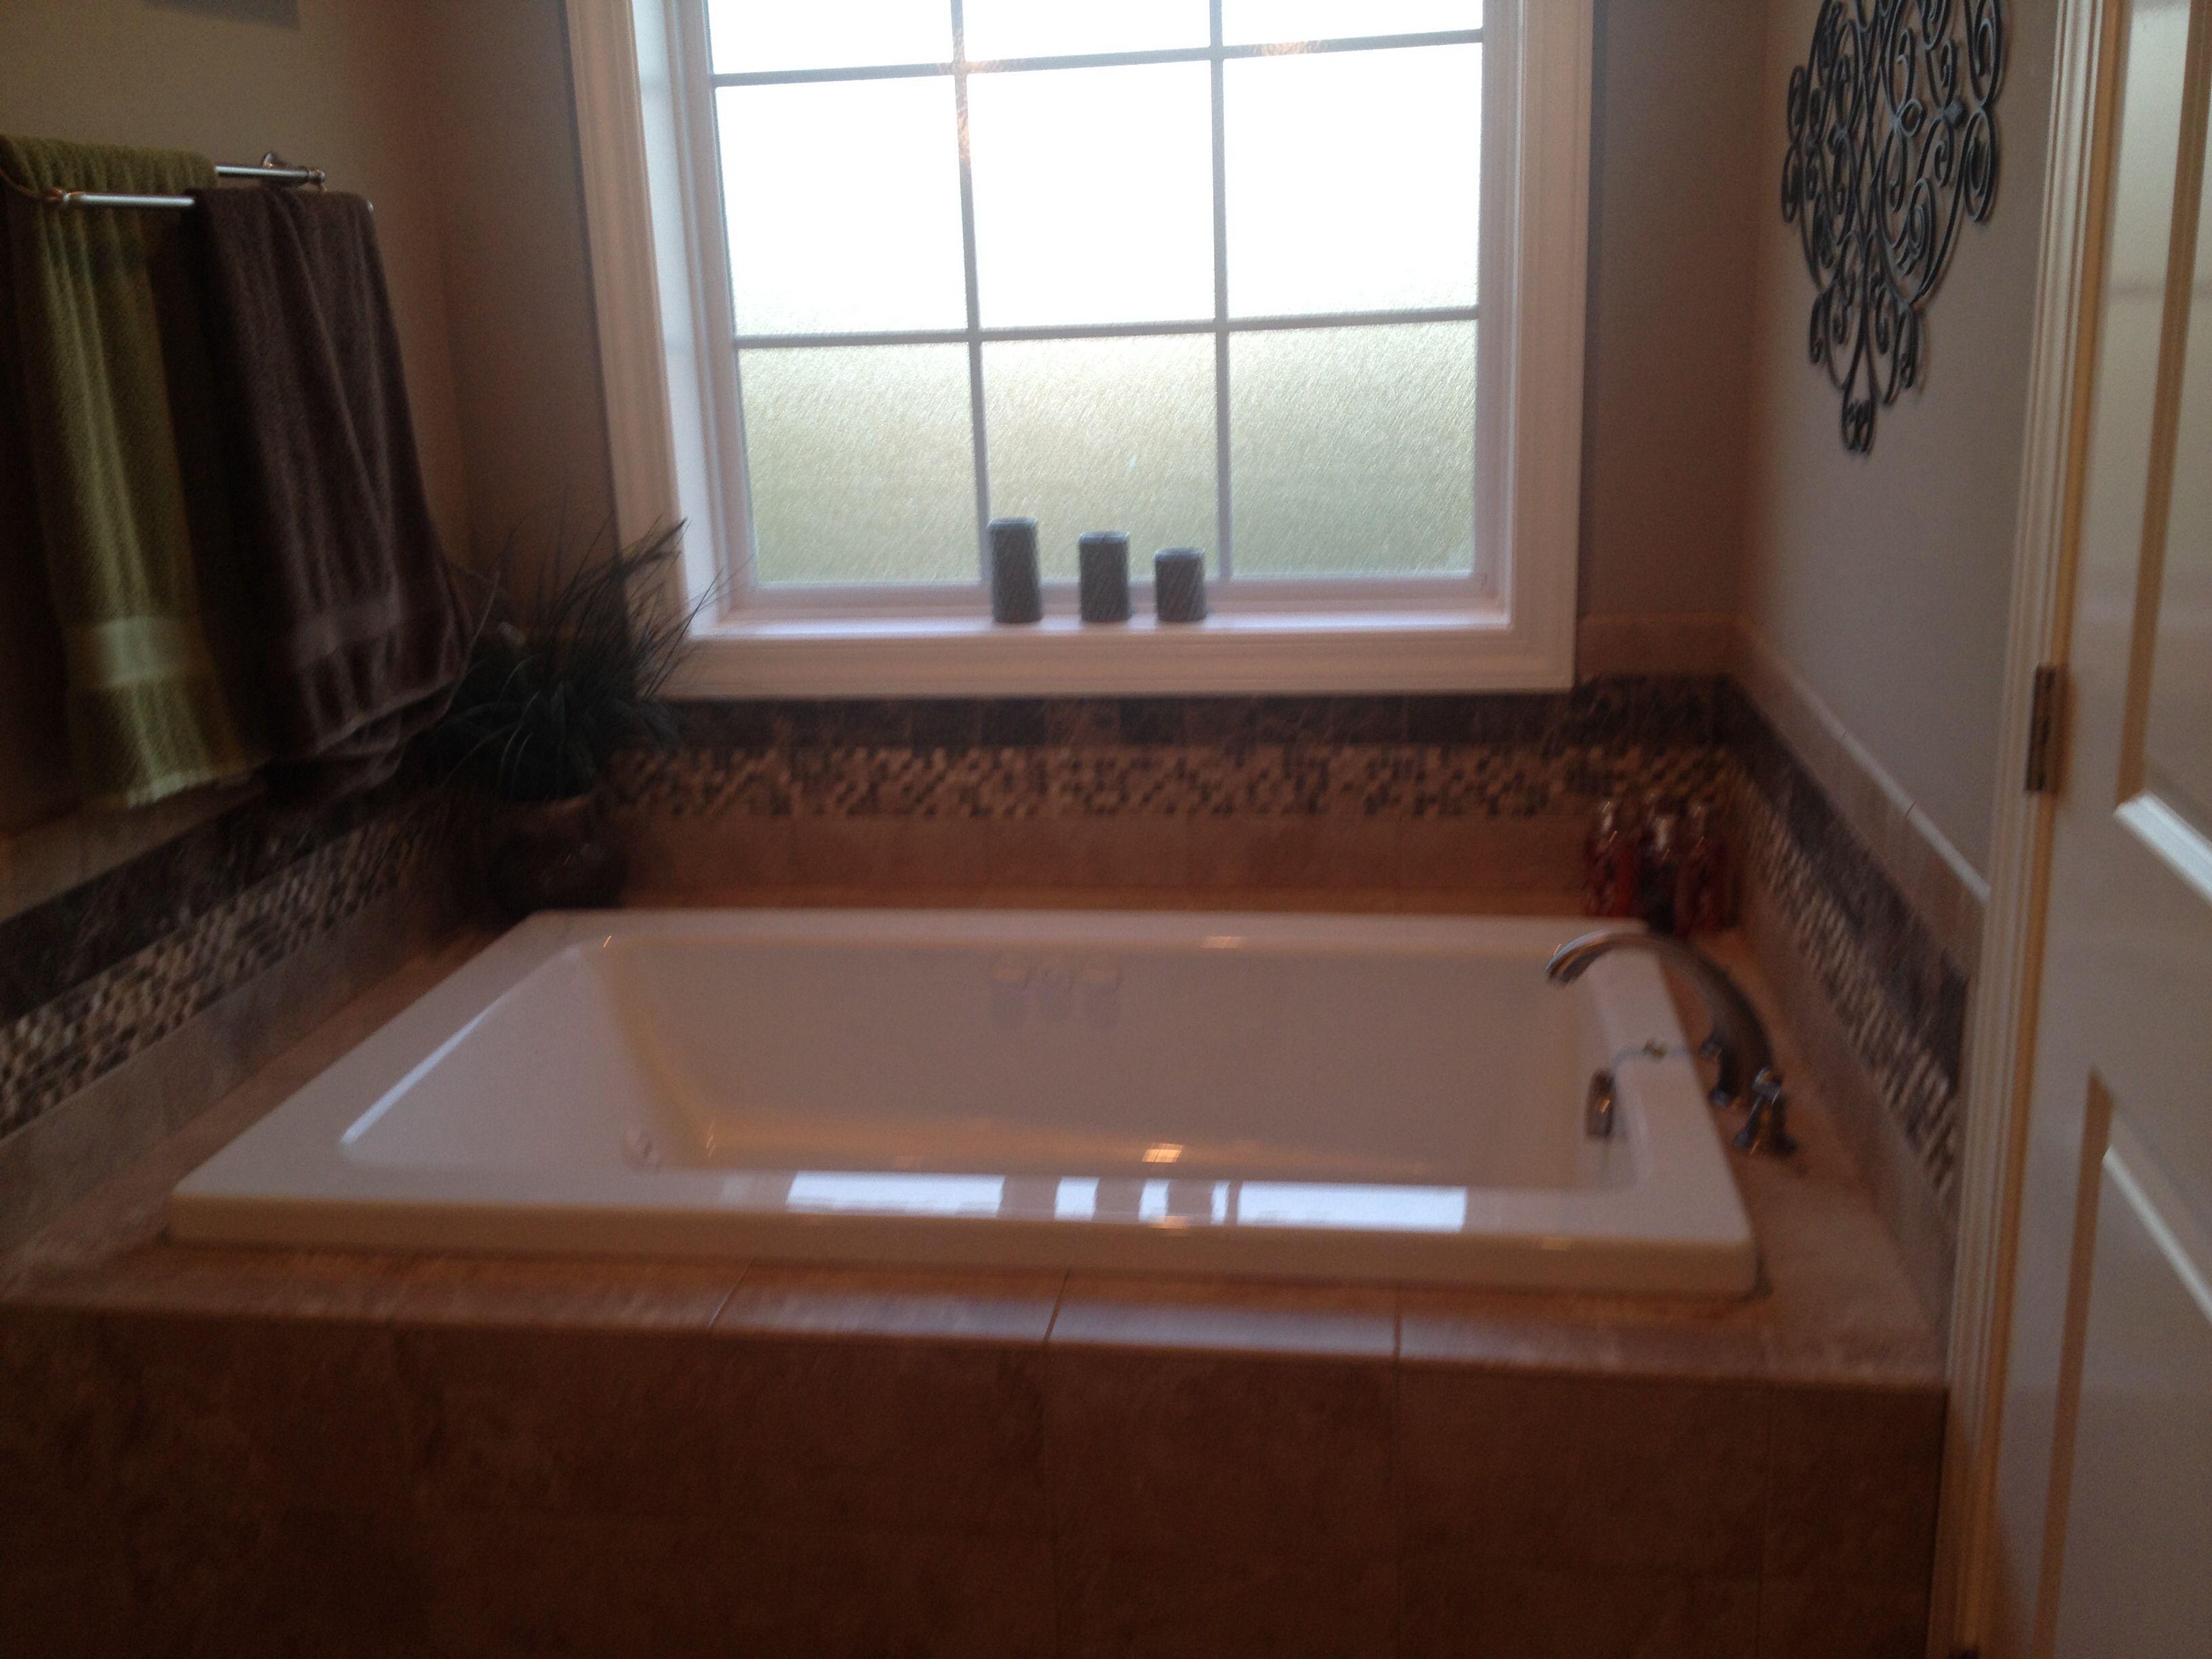 Master bathroom jacuzzi tub   Ideas For The Home   Pinterest